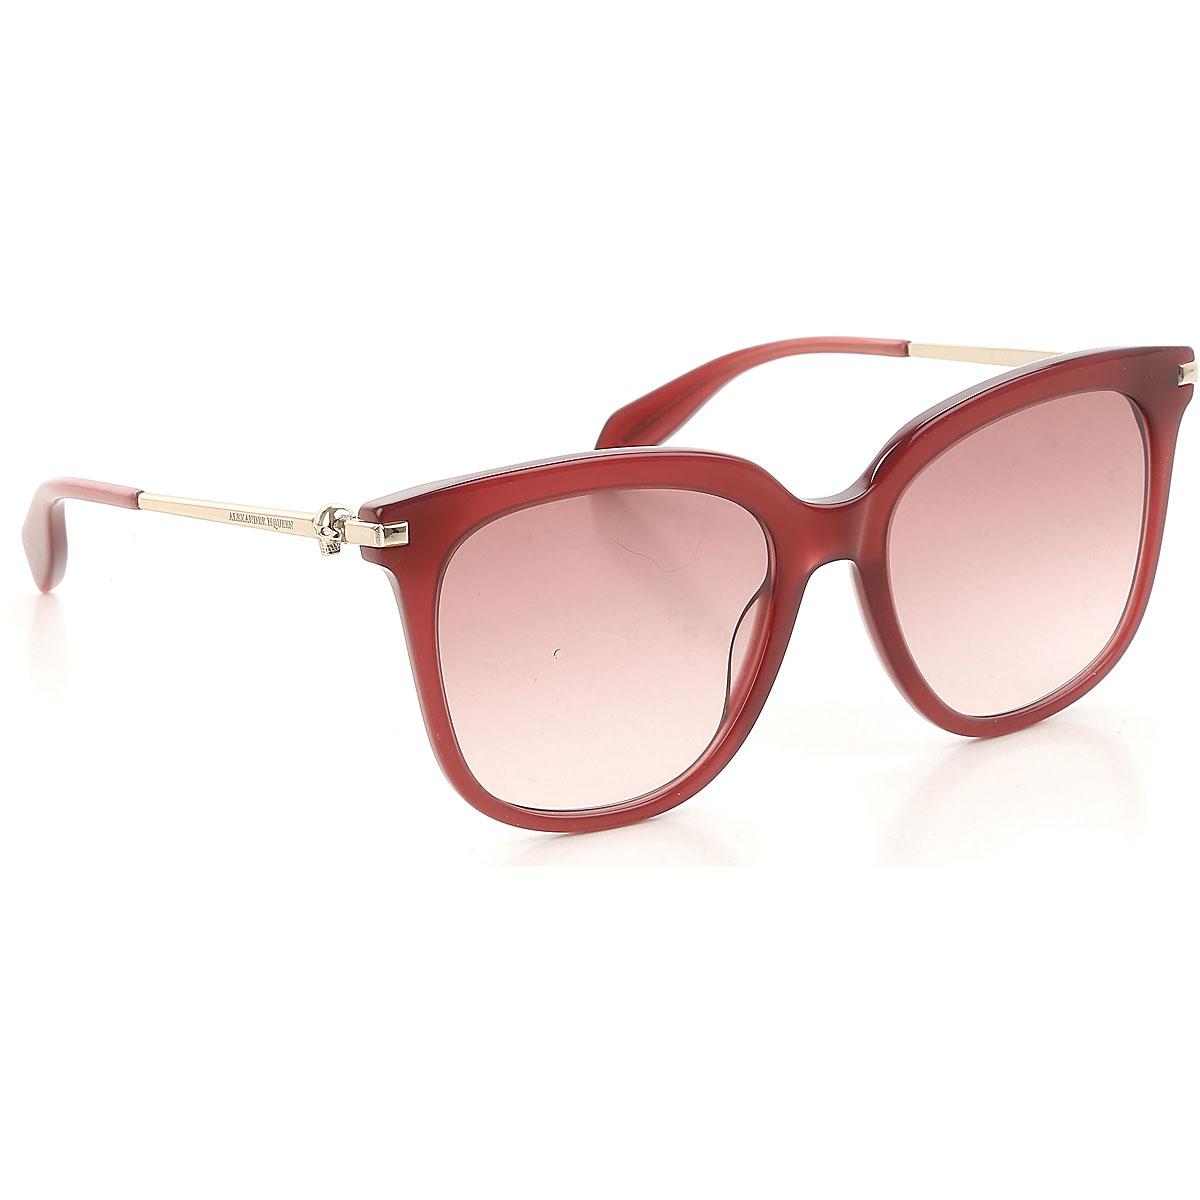 Alexander McQueen Sunglasses On Sale, Burgundy, 2019